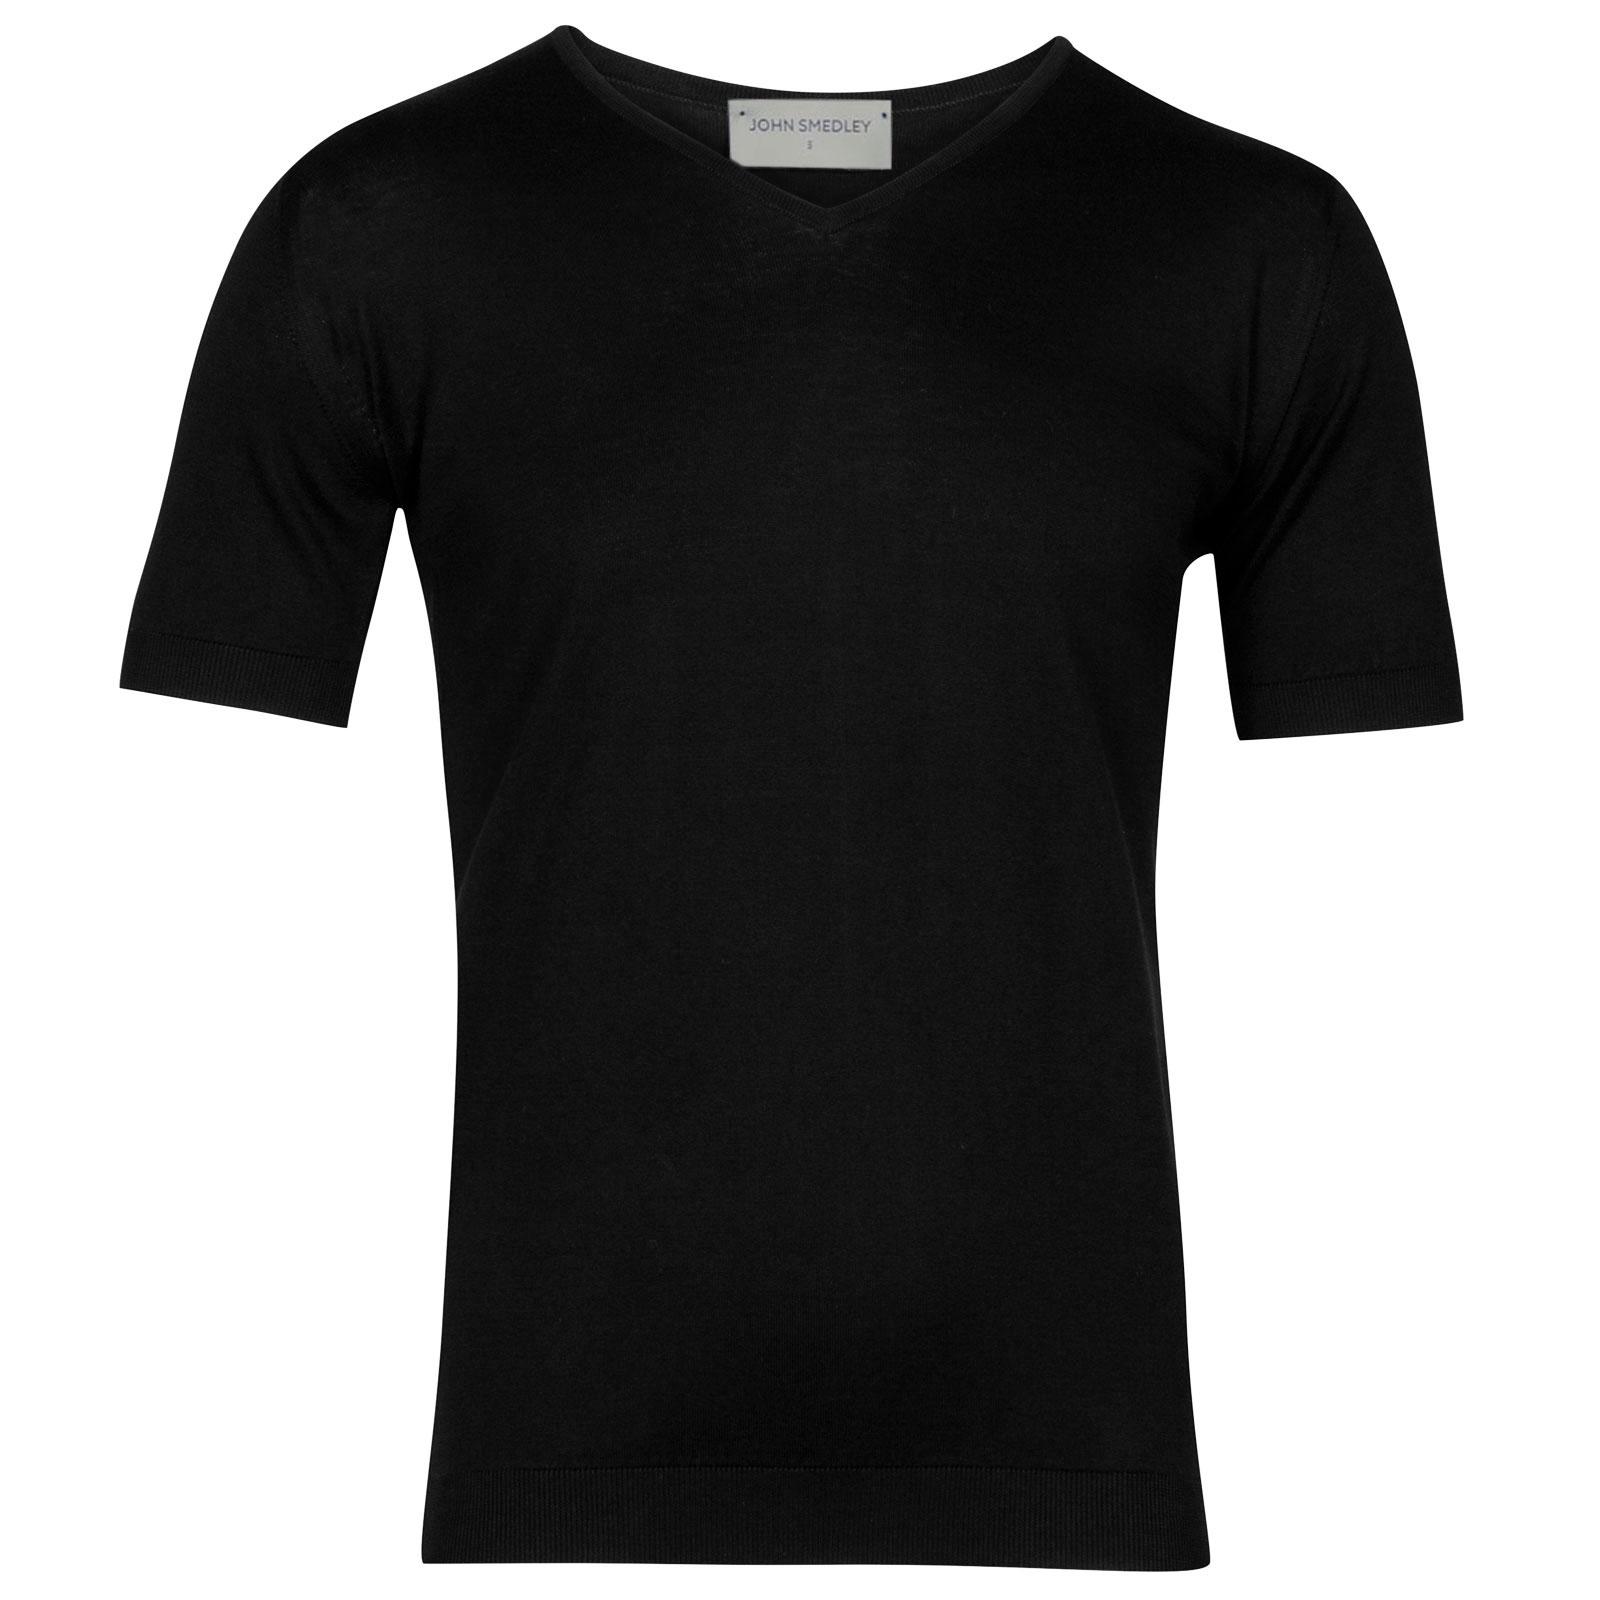 John Smedley Braedon Sea Island Cotton T-shirt in Black-M